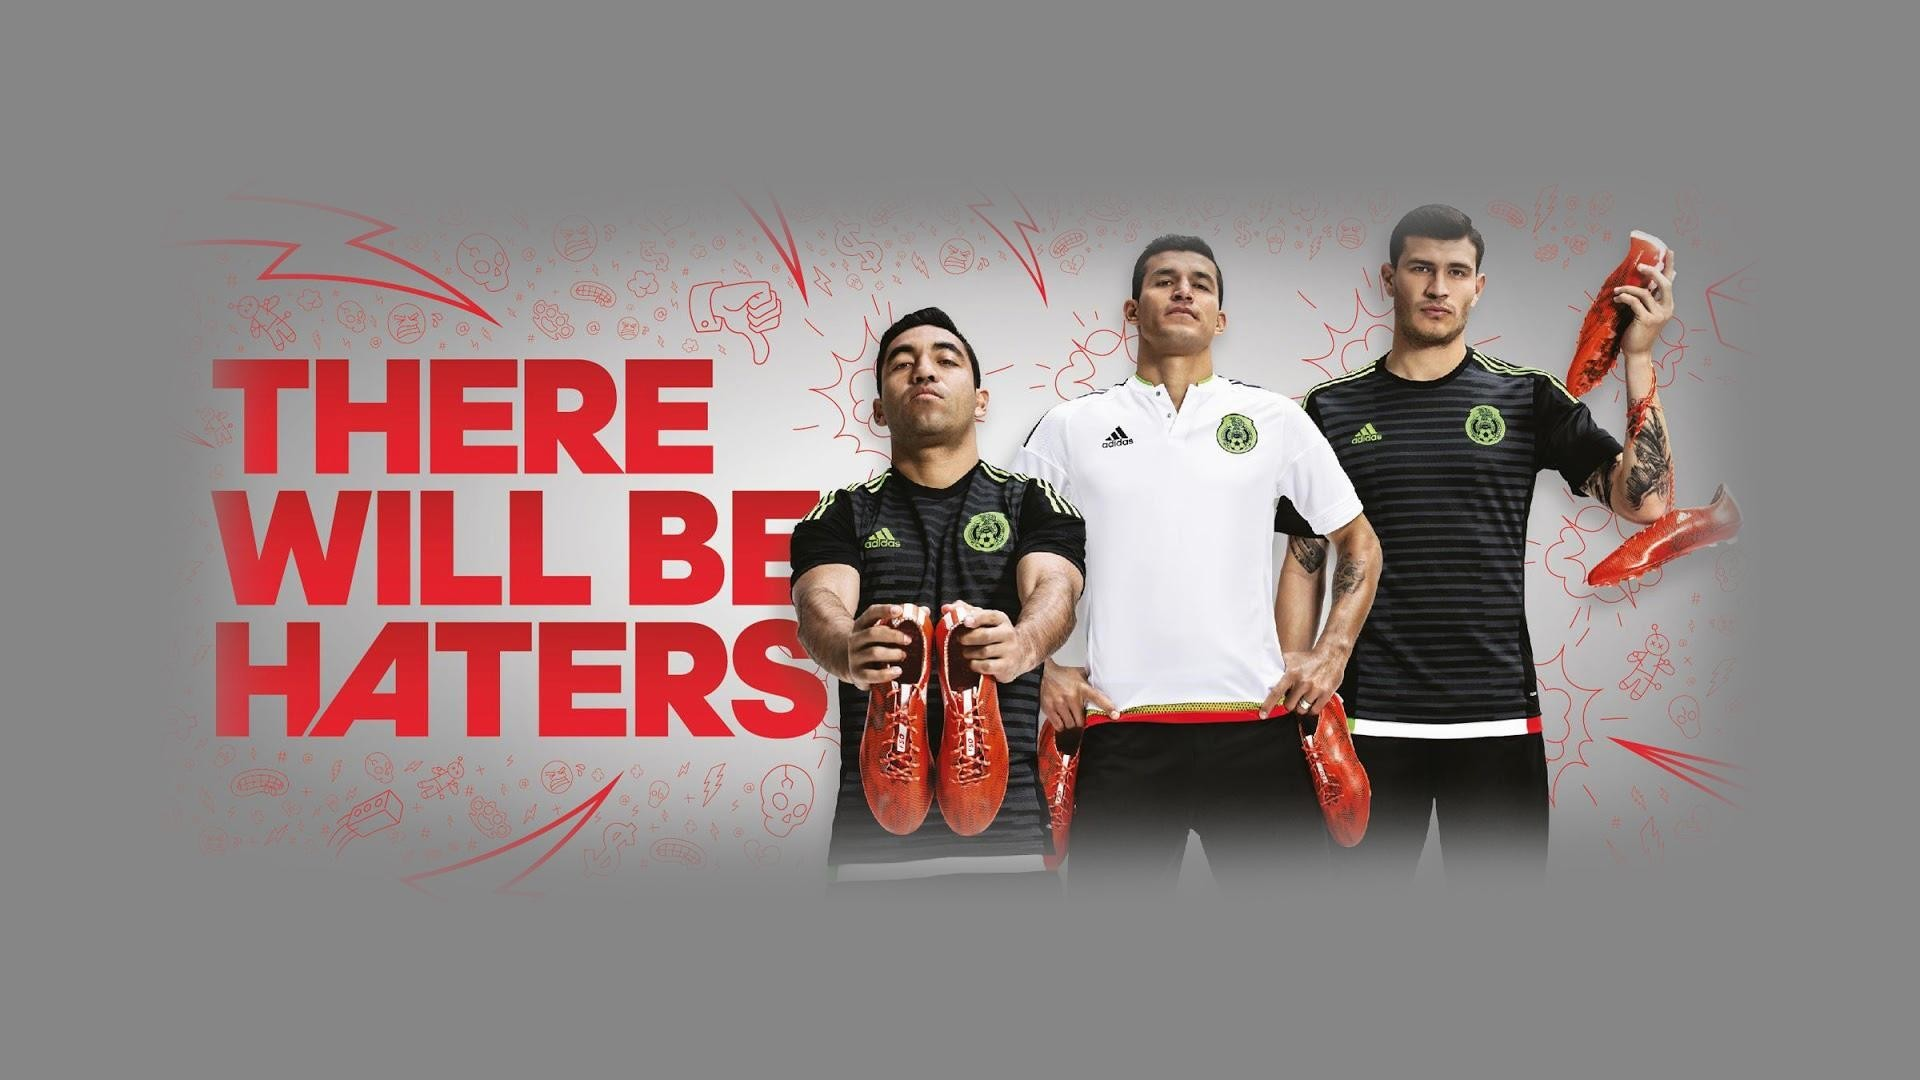 1920x1080 1920x1080 wallpaper.wiki-Free-Download-Cool-Soccer-Image-